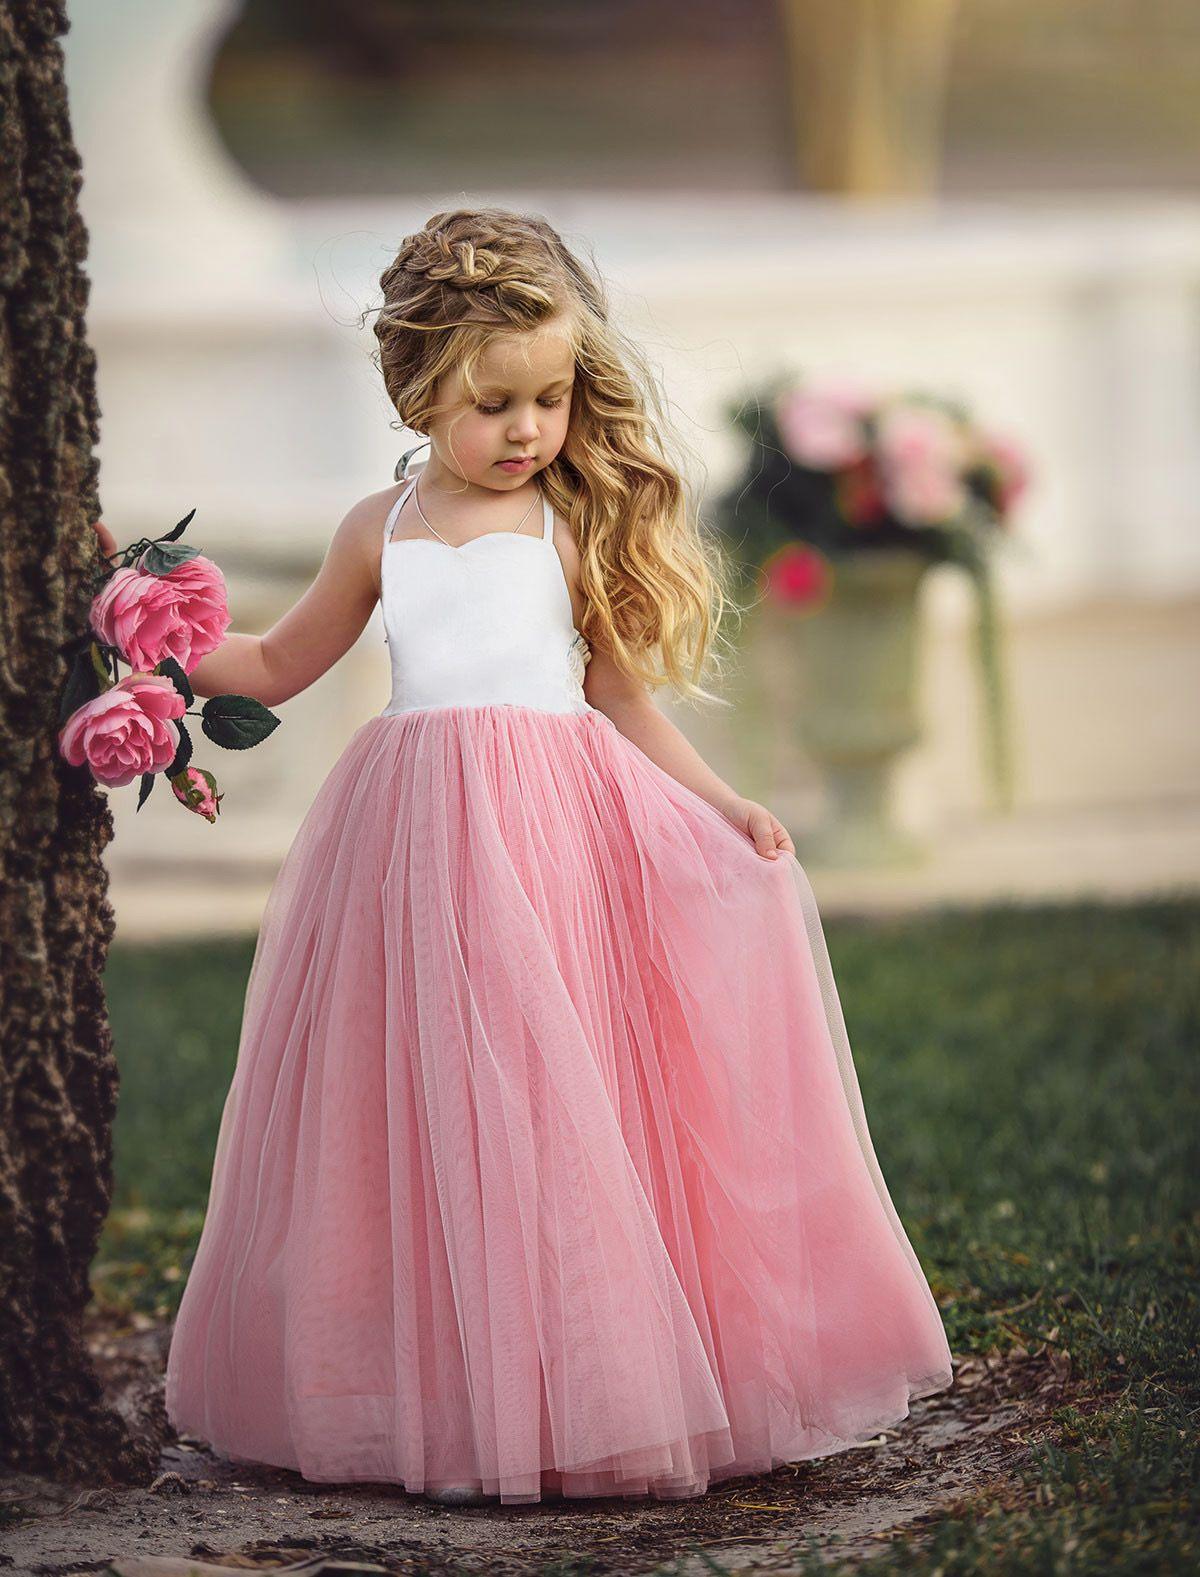 2018 New Style Princess Kids Girl Pink Lace Flower Strappy Dress